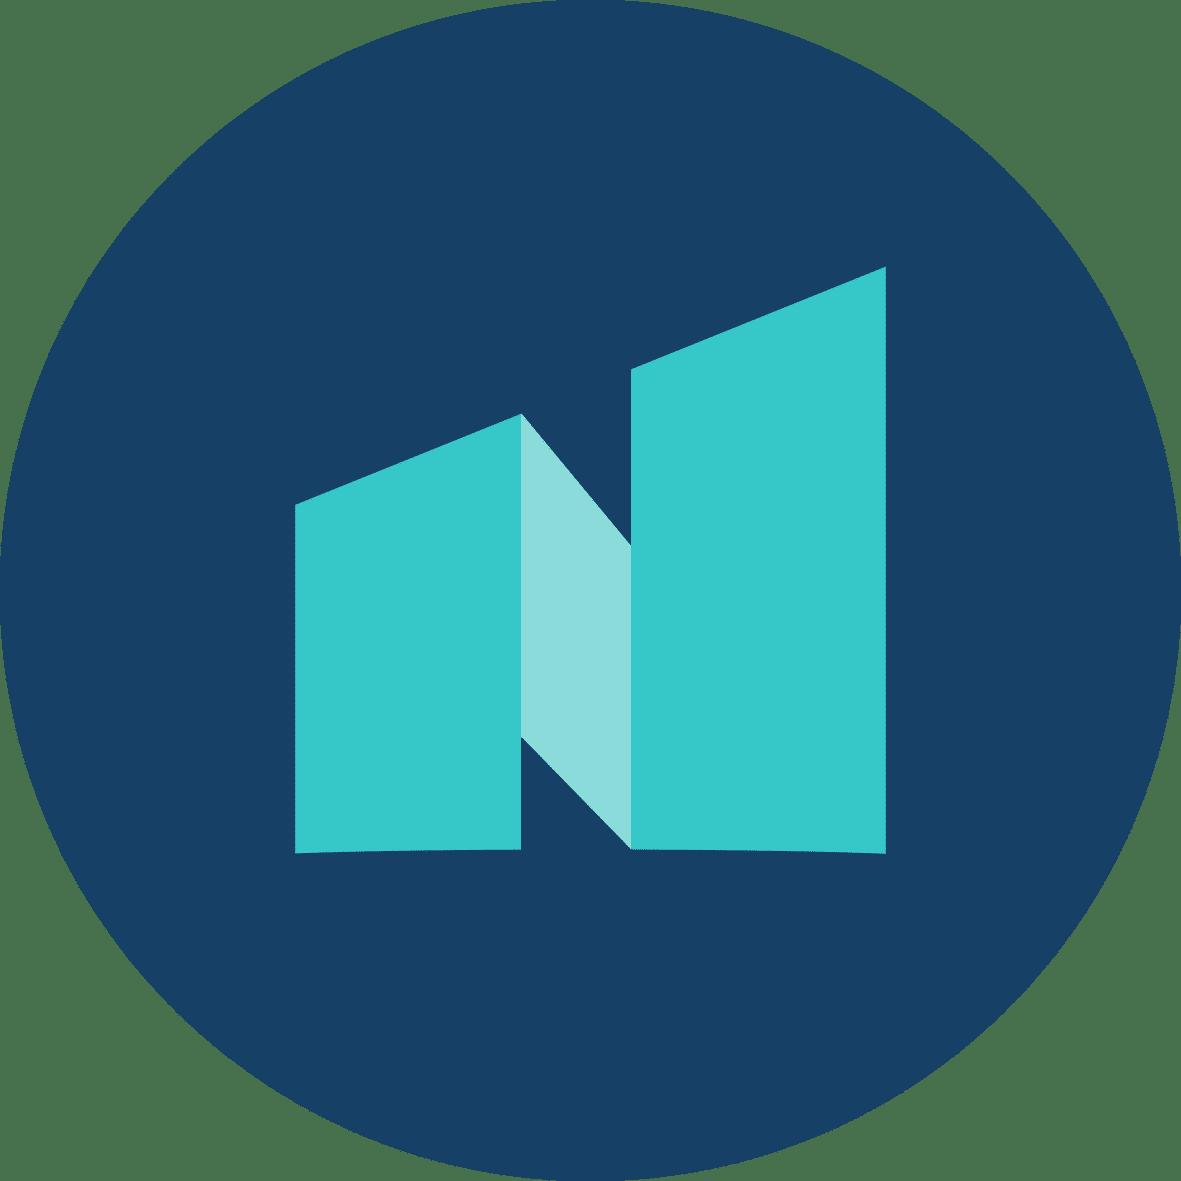 Netigate logo, kommunikatörers största utmaningar